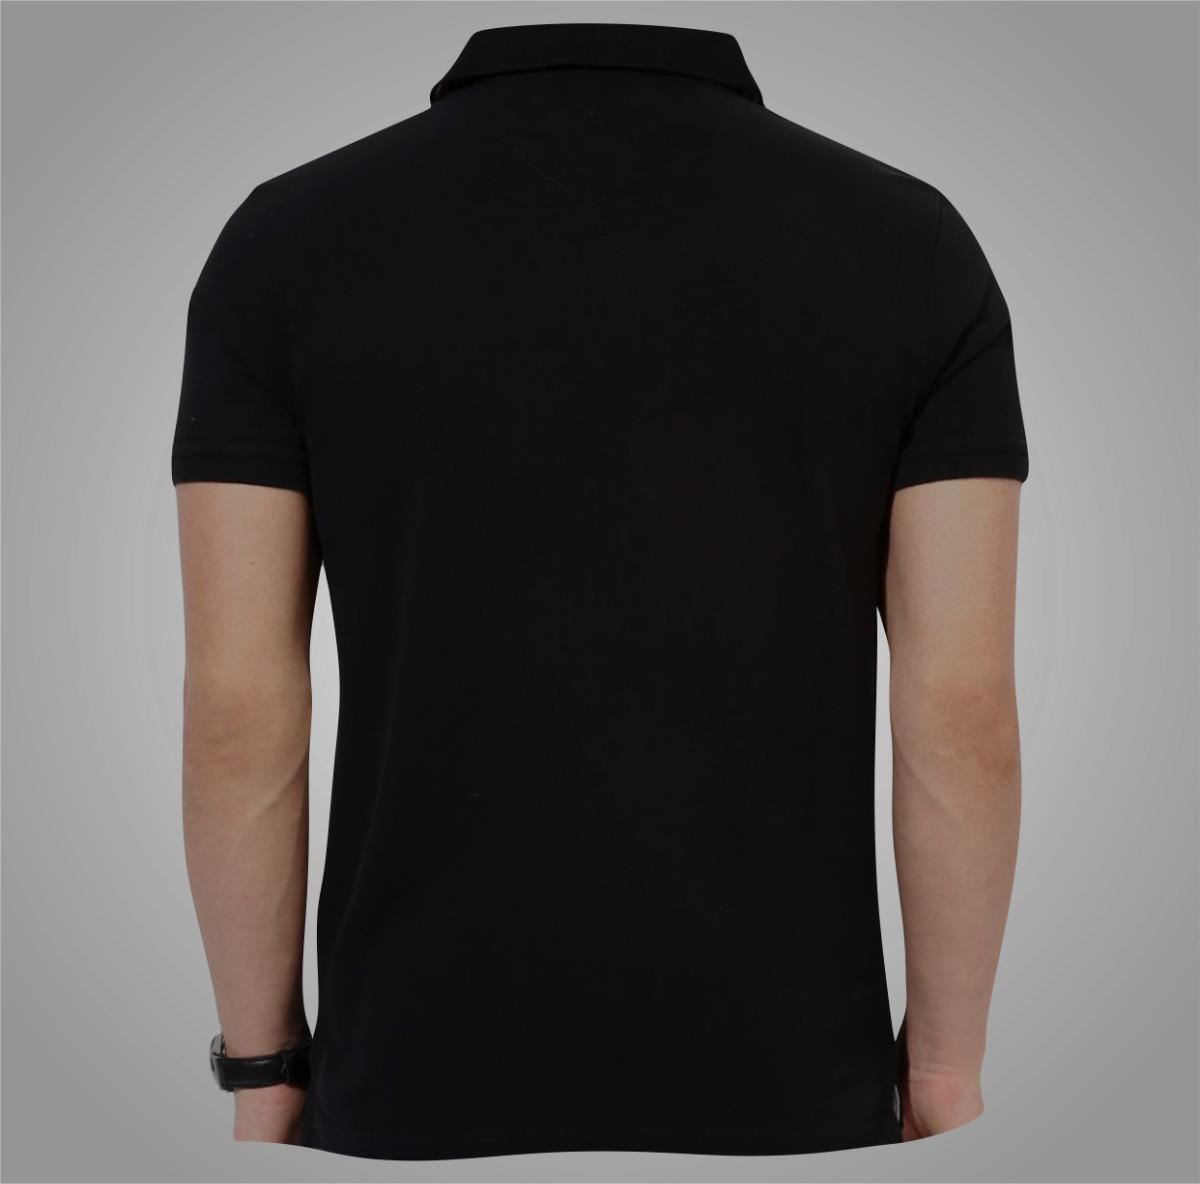 5fd633b105a330 Camisa Camiseta Polo Preta Masculino Ou Feminino Baby Look - R$ 44 ...